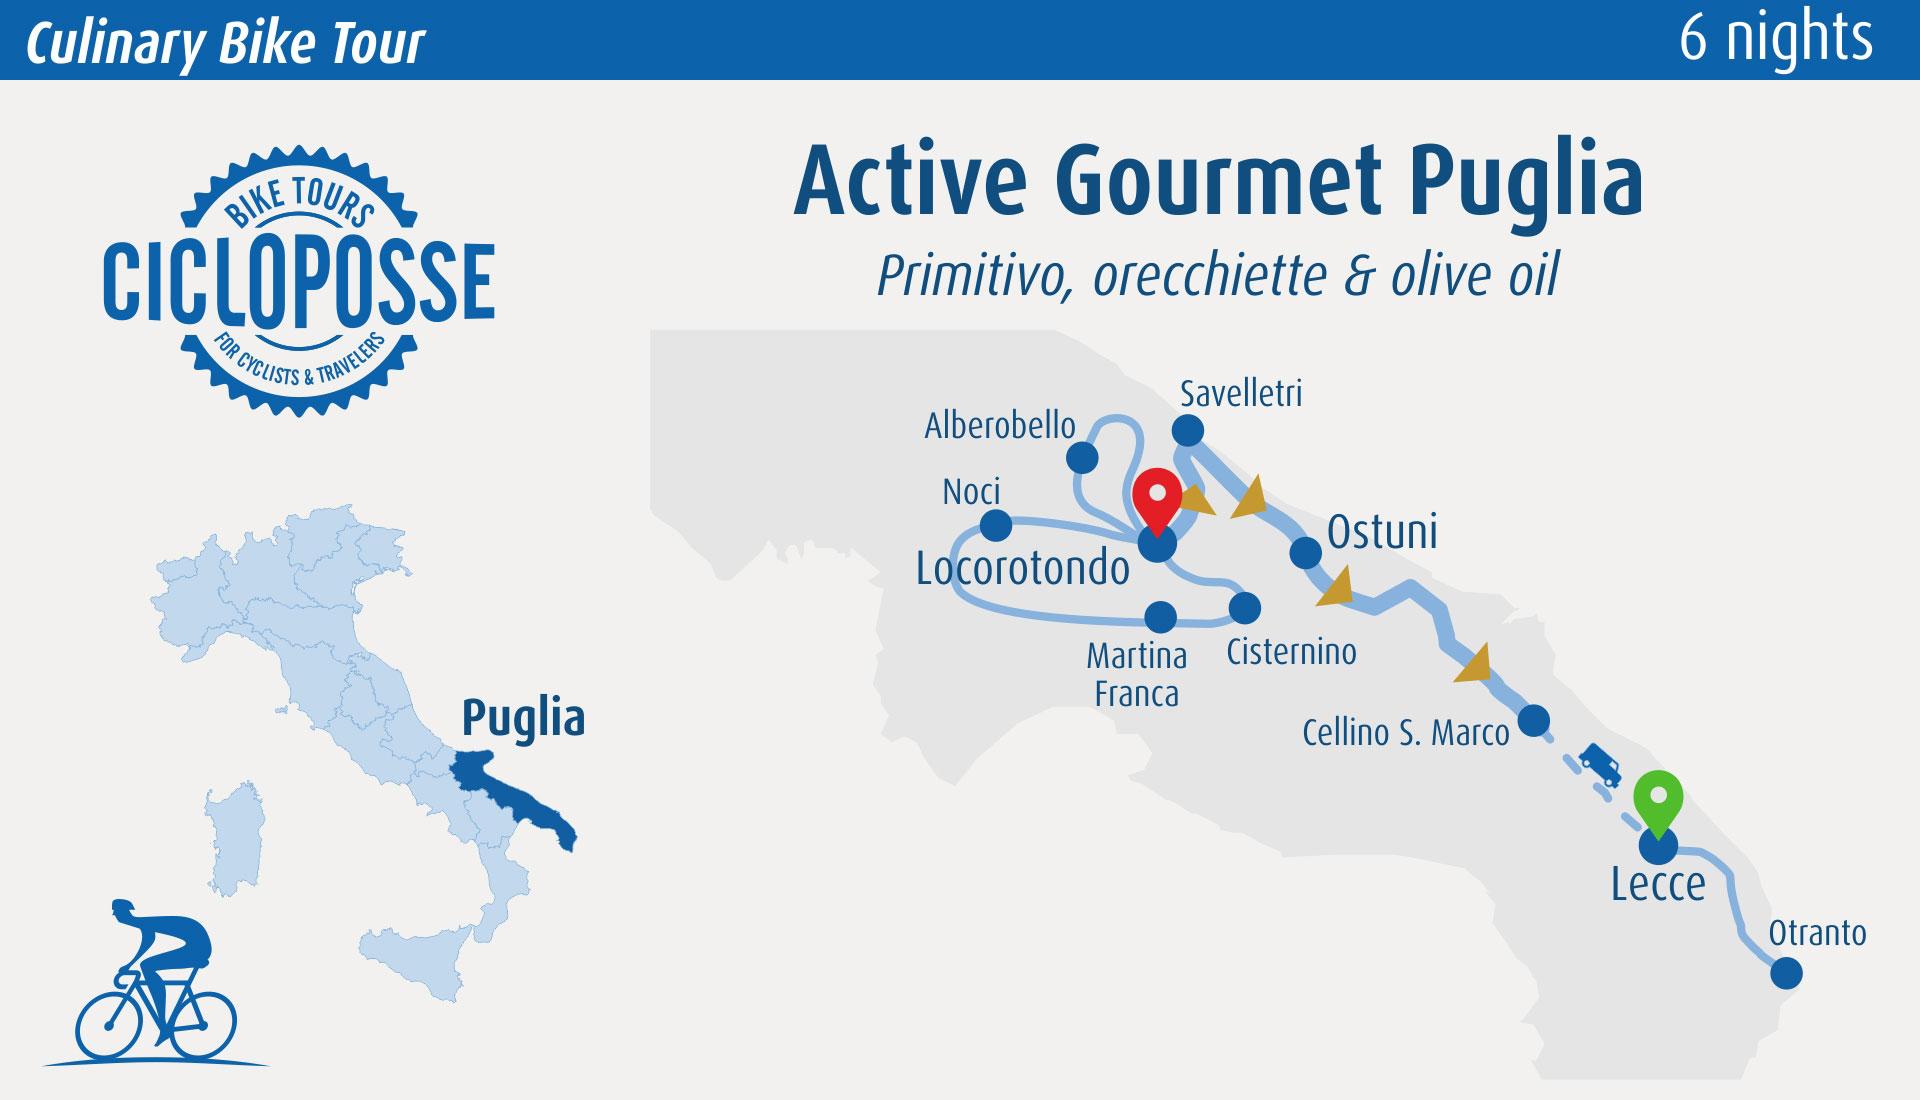 puglia bike tour - active gourmet